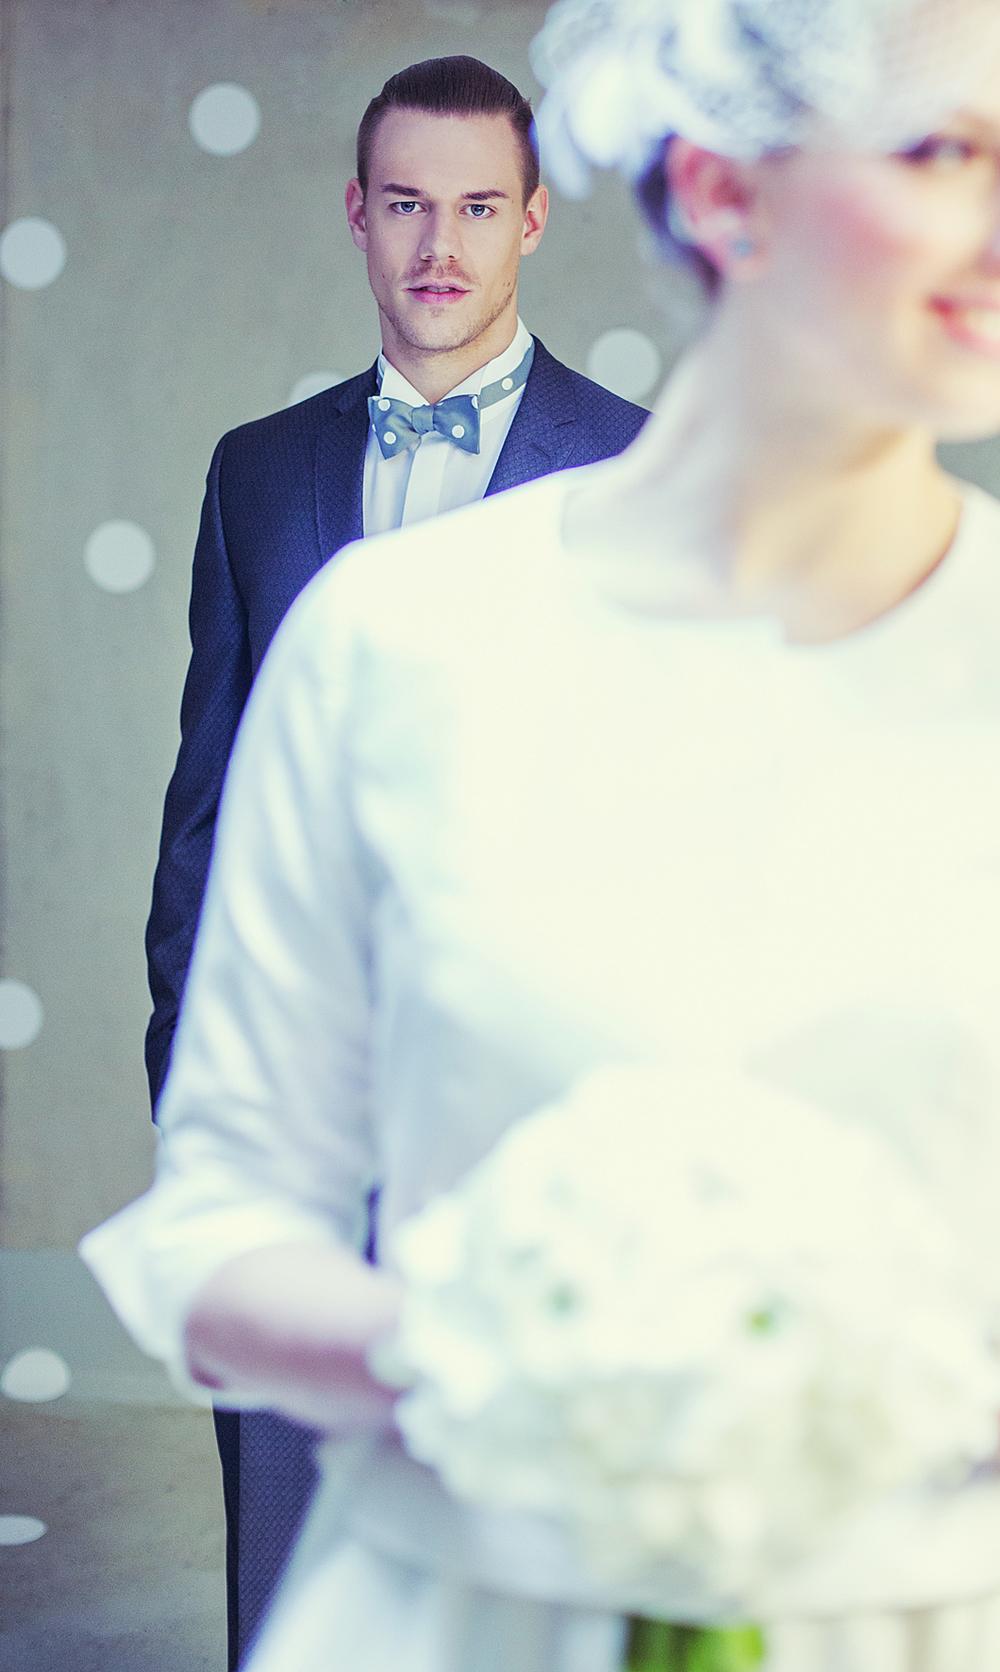 Syleshooting_pure-wedding_024.jpg